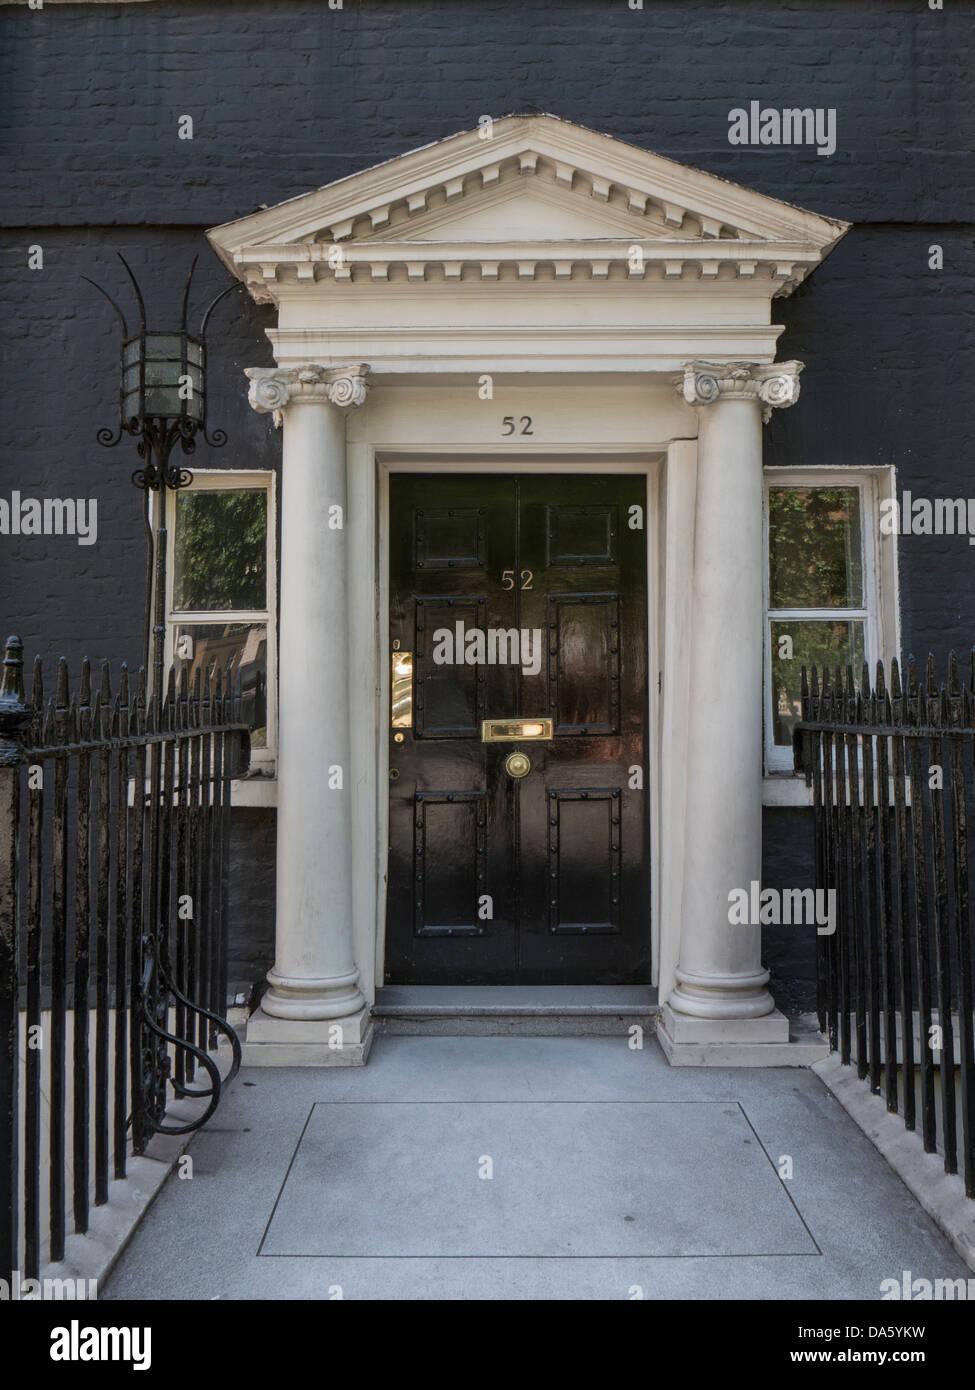 Door to Georgian house in Mayfair, London - Stock Image